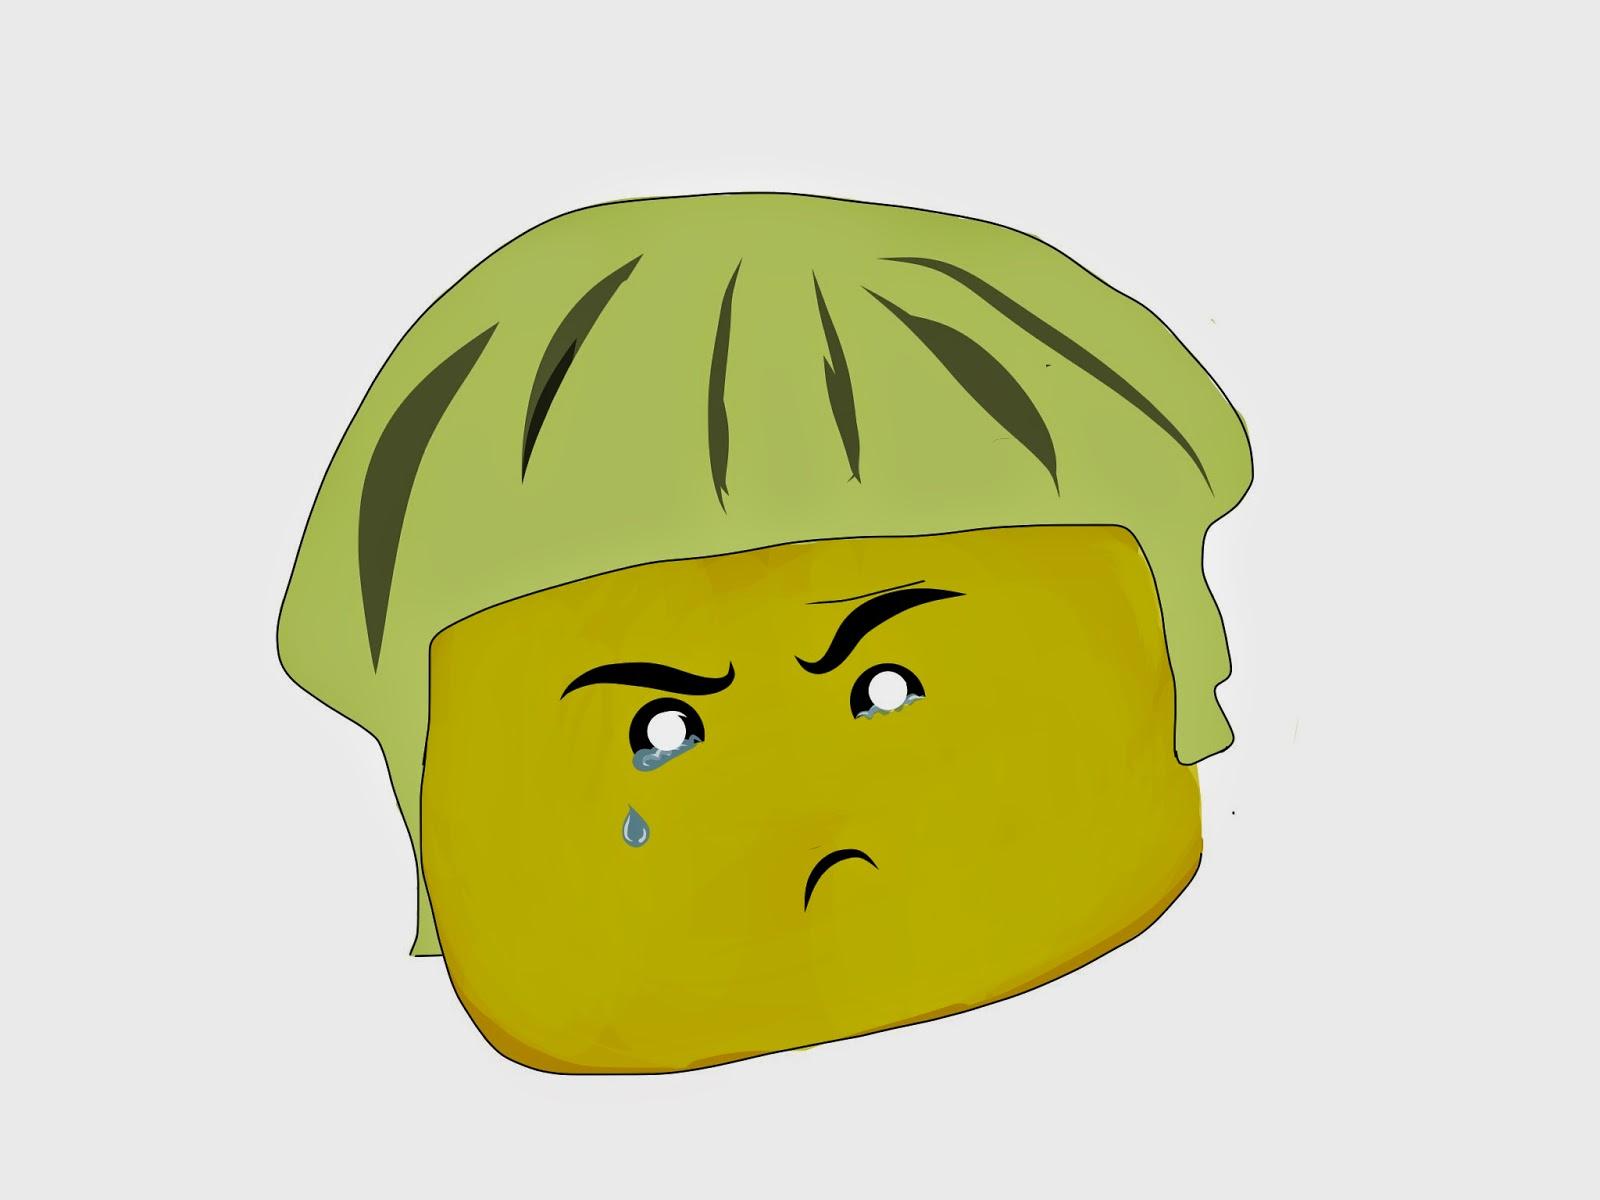 Petulant clipart image transparent stock Ninjago and Minecraft Emoji: NEW Lloyd Ninjago EMOJI ... image transparent stock